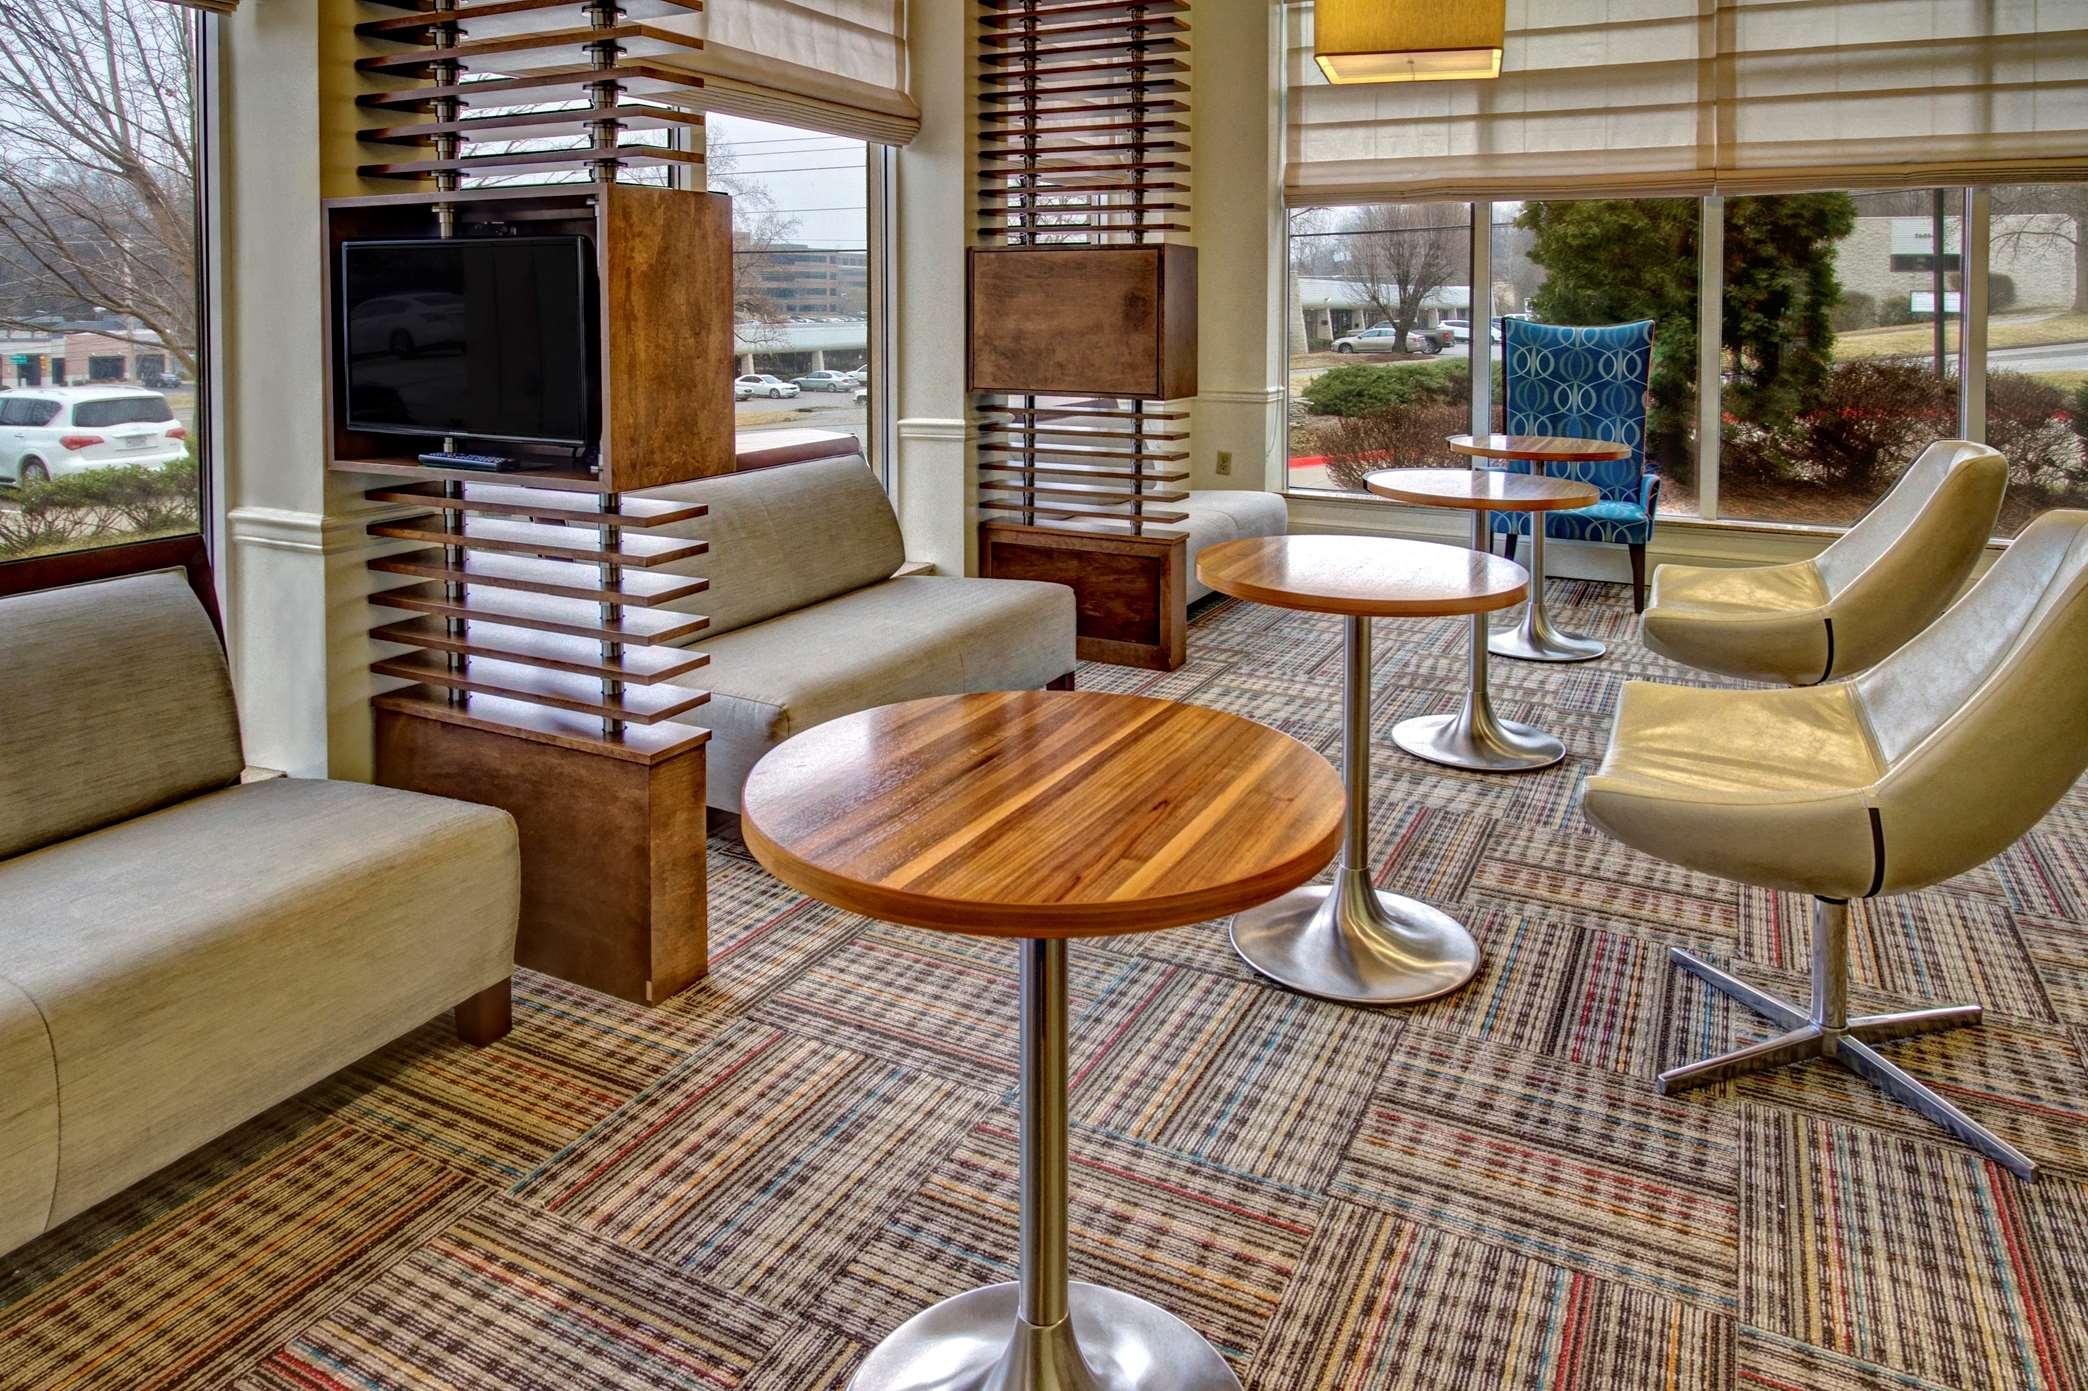 Hilton Garden Inn Nashville Airport image 22